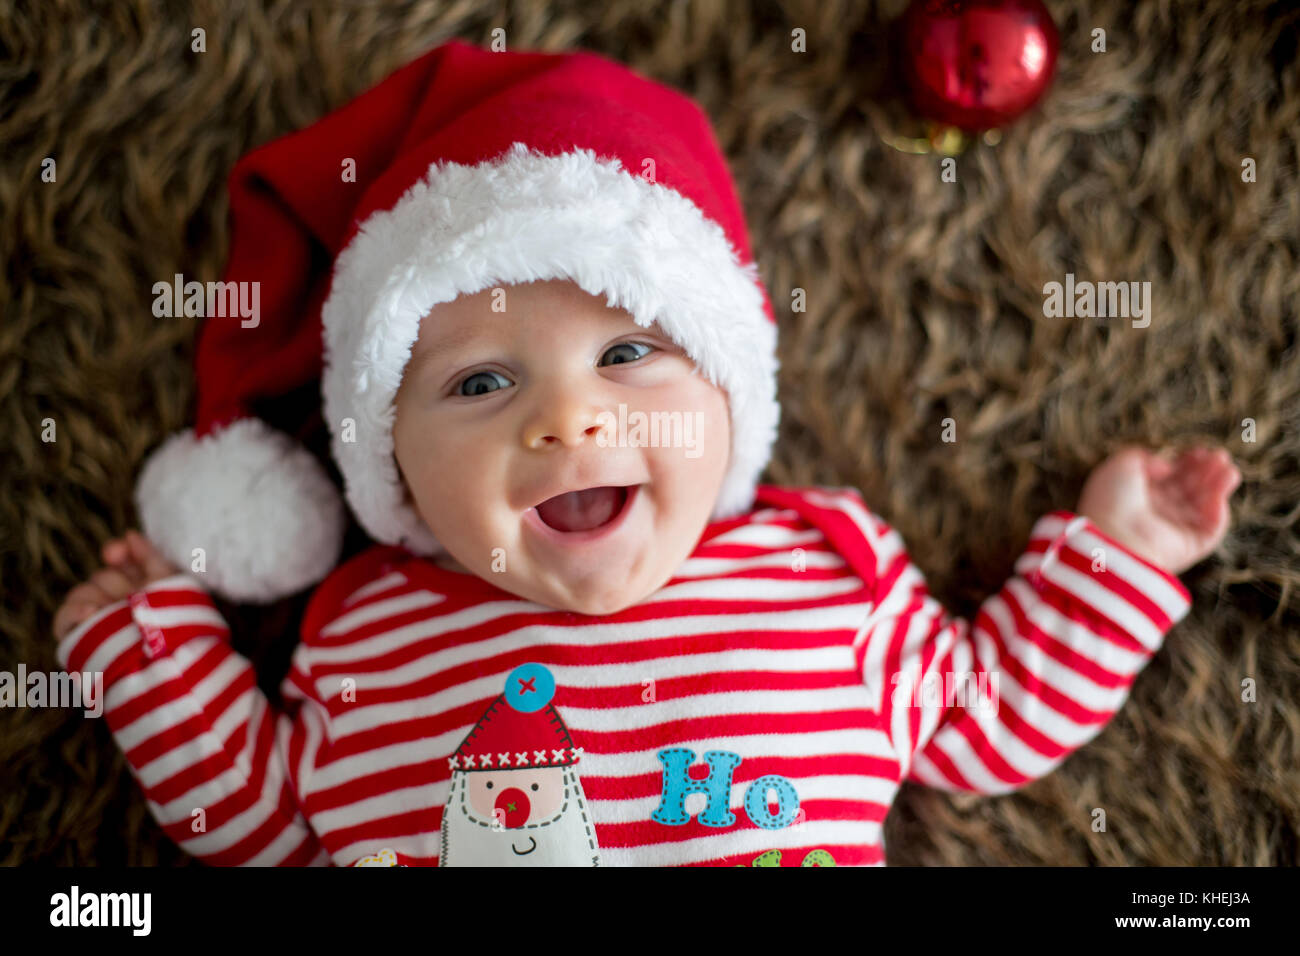 5fc4b9e7d19c3 Christmas portrait of cute little newborn baby boy